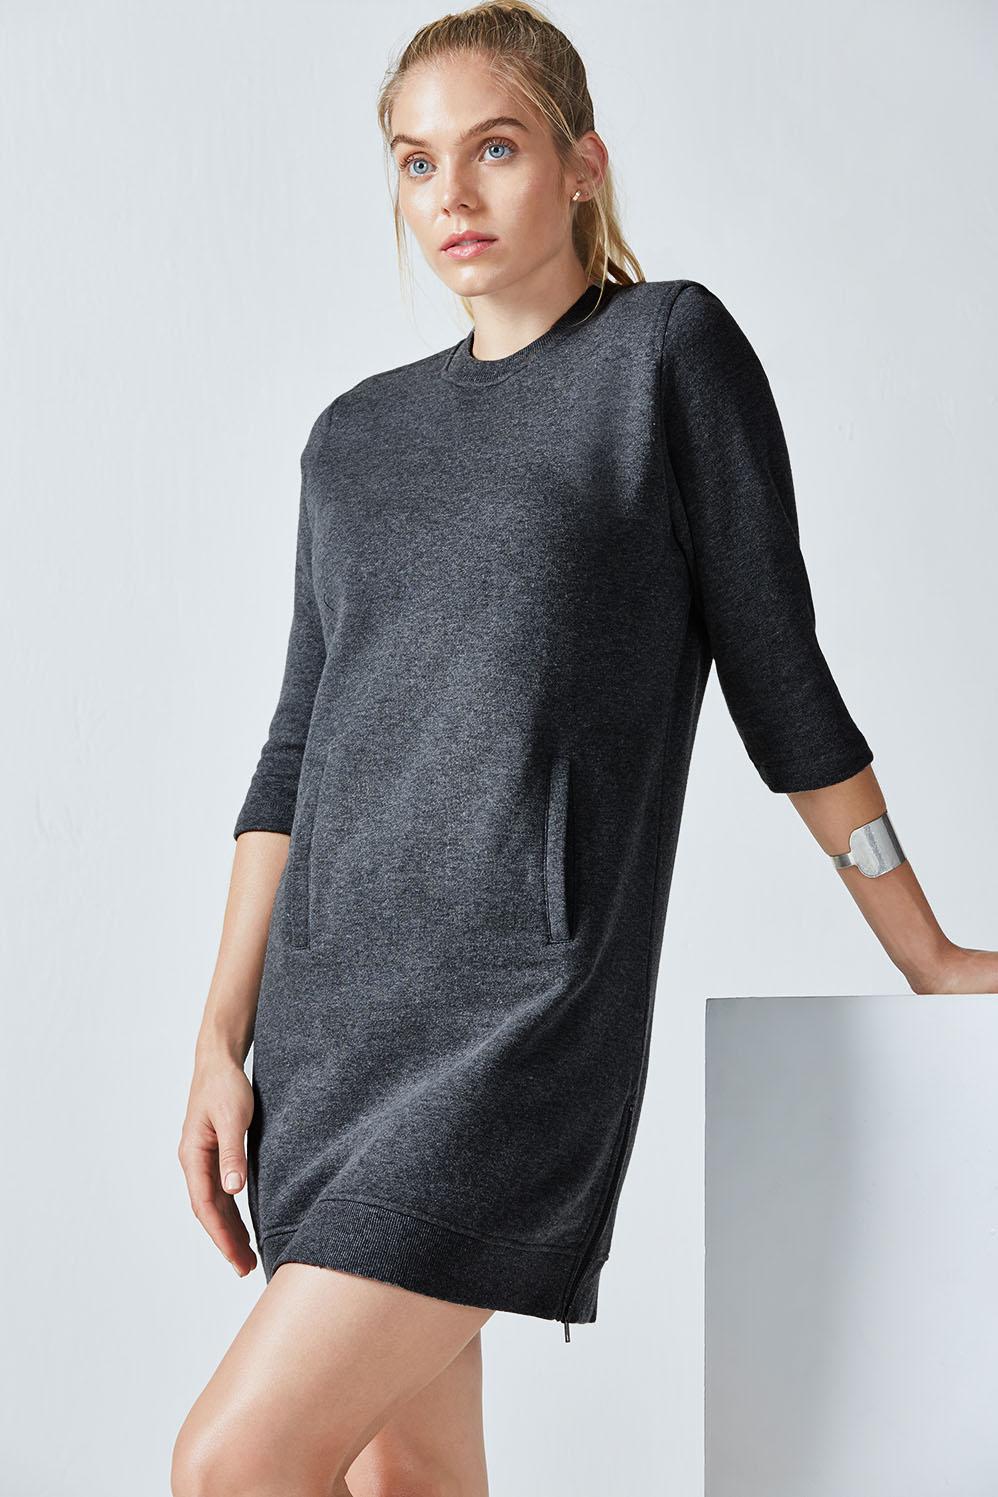 Fabletics Dresses/Rompers Elena Dress Womens Black Heather Size XXS